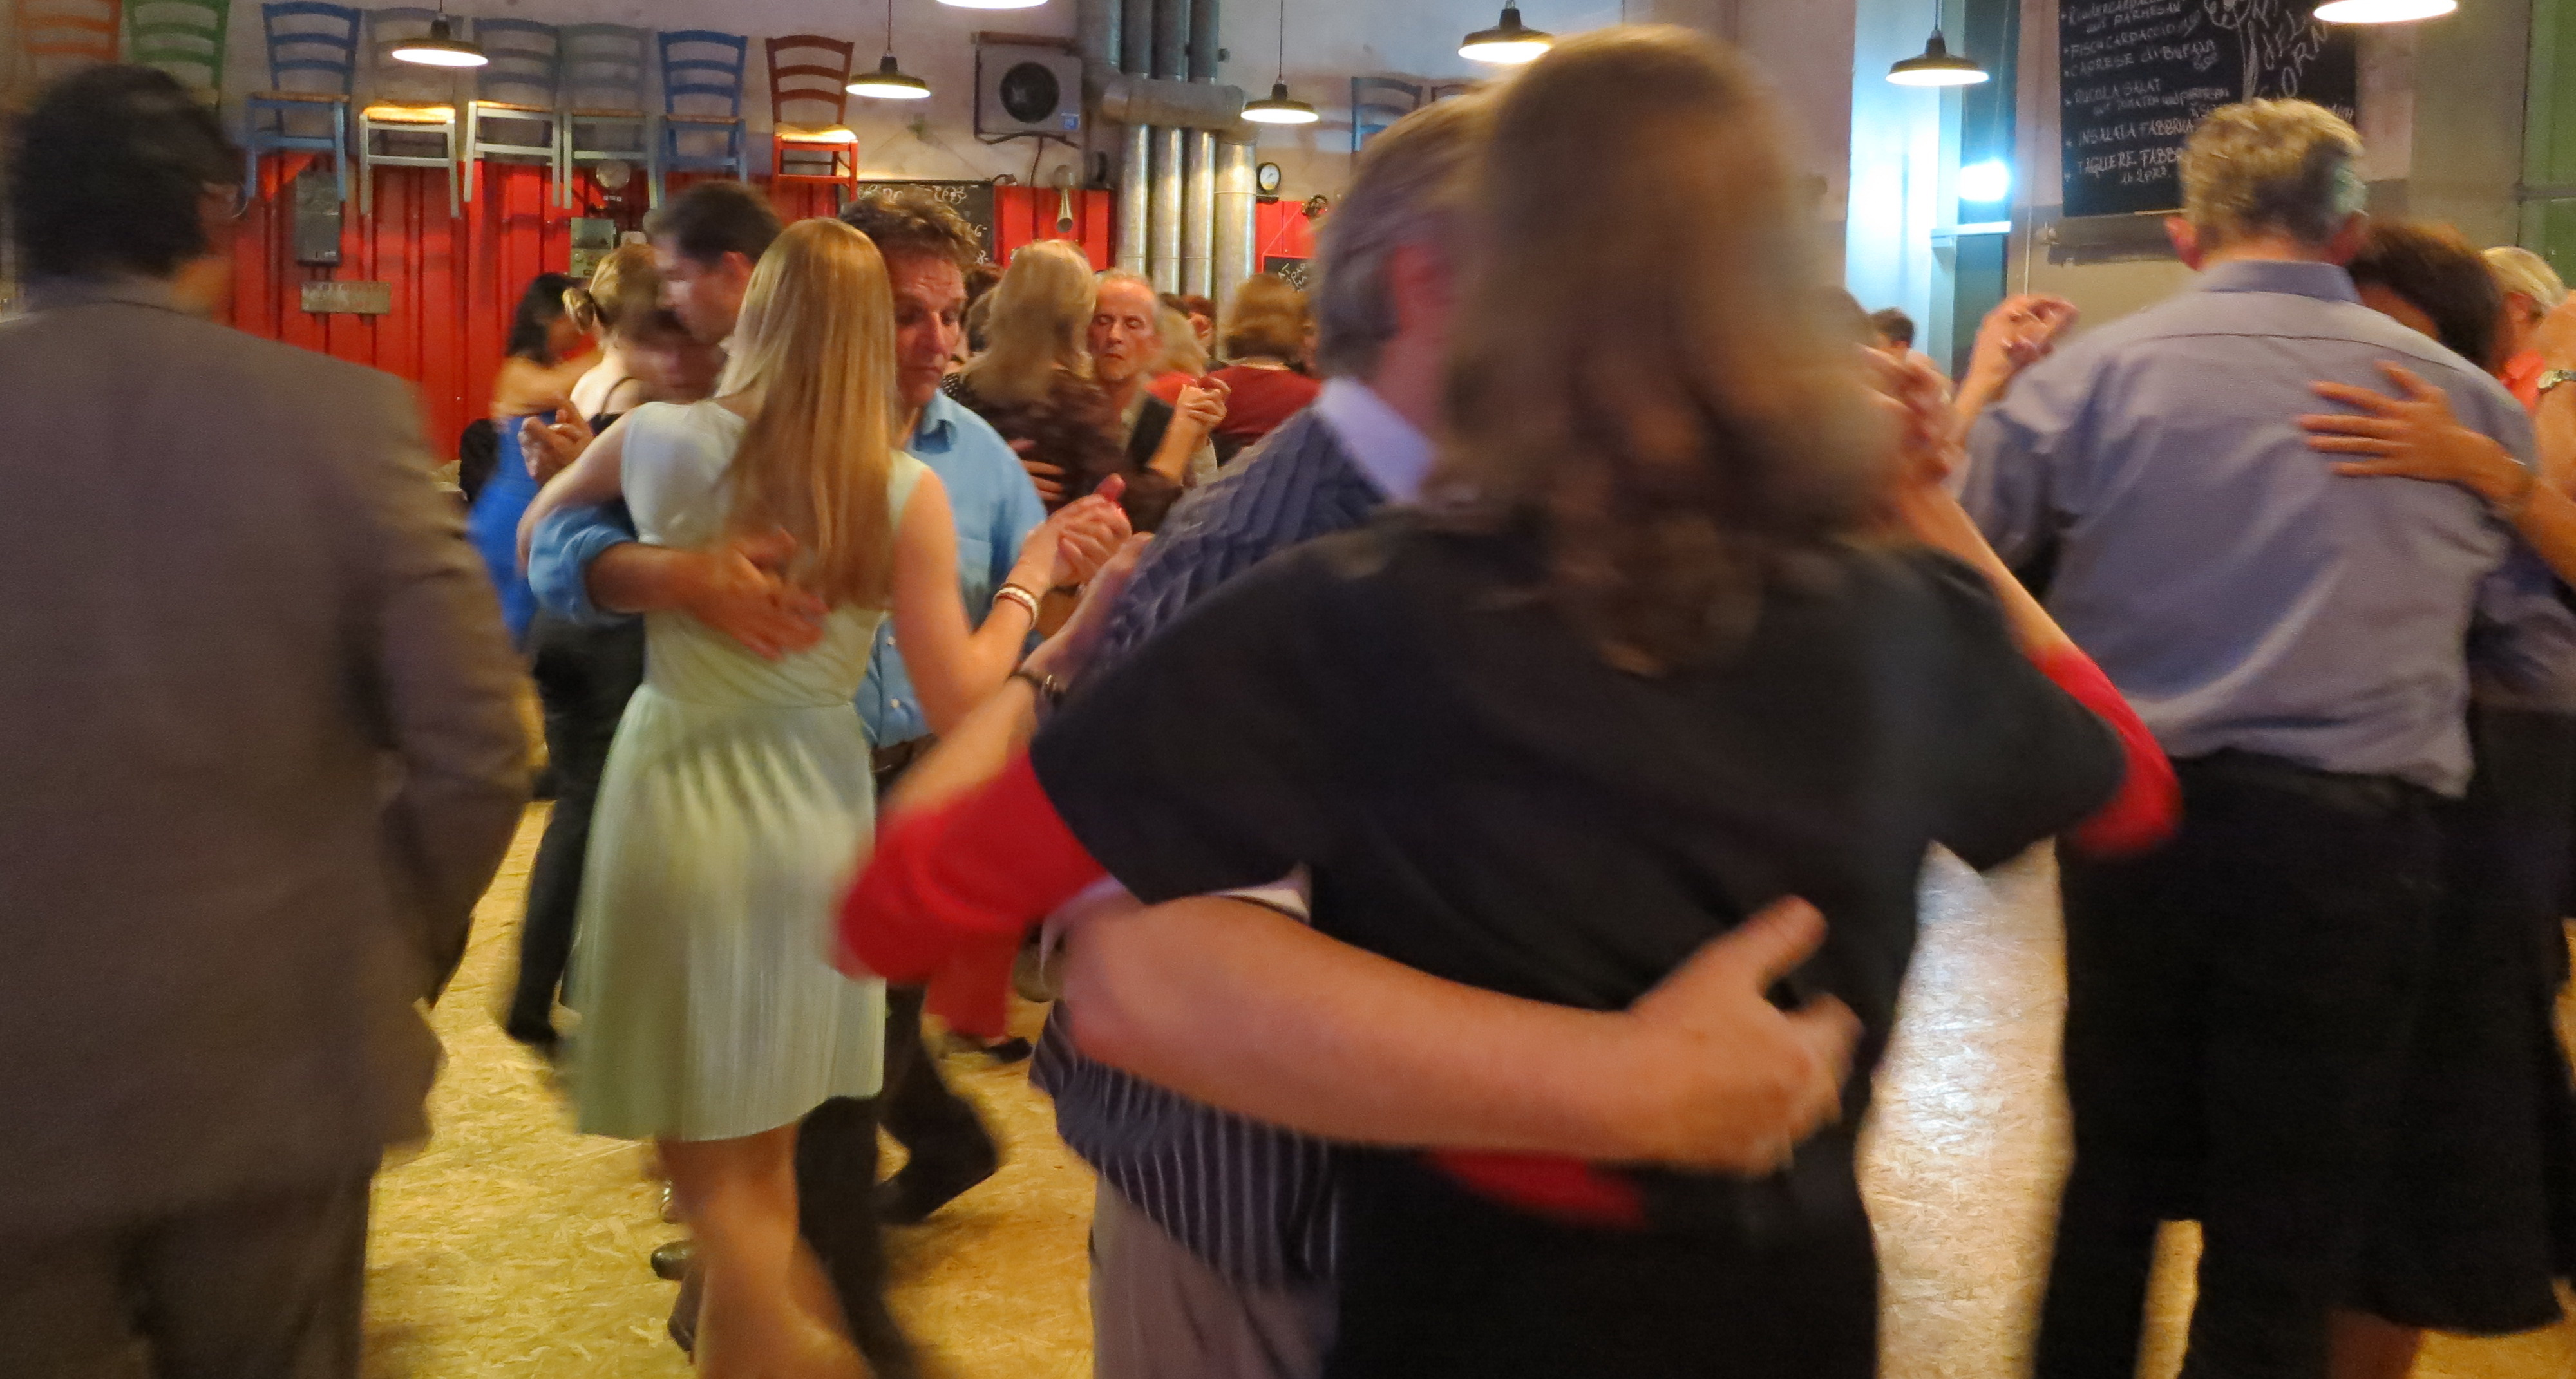 tangokurse in münchen ☆ unterricht bei tango lugo!